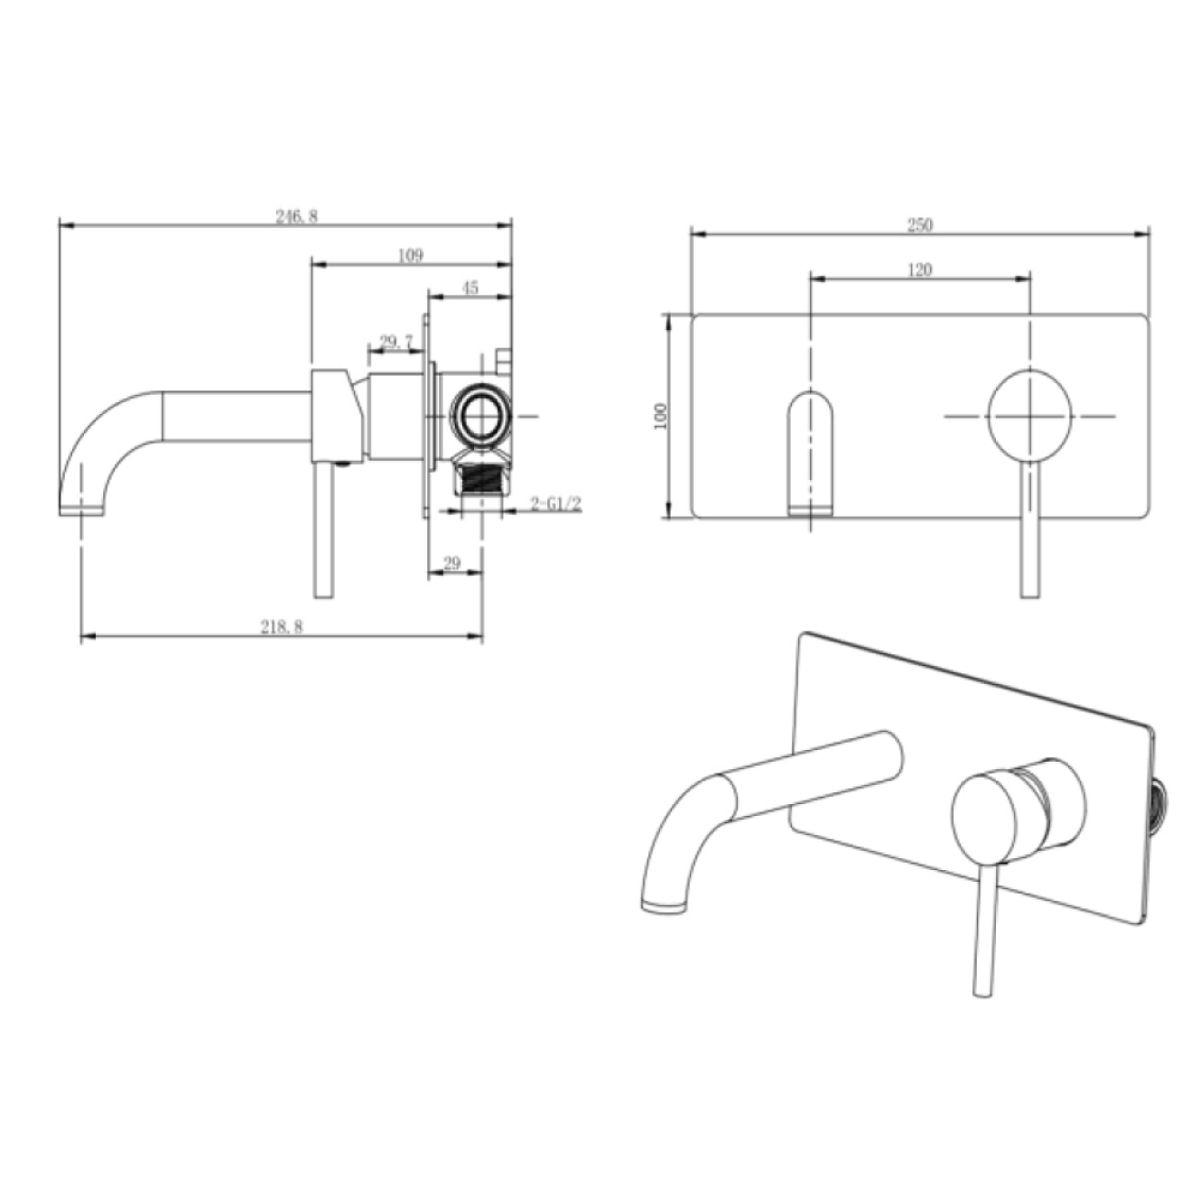 RAK Prima Tech Wall Mounted Basin Mixer Tap with Backplate Measurements